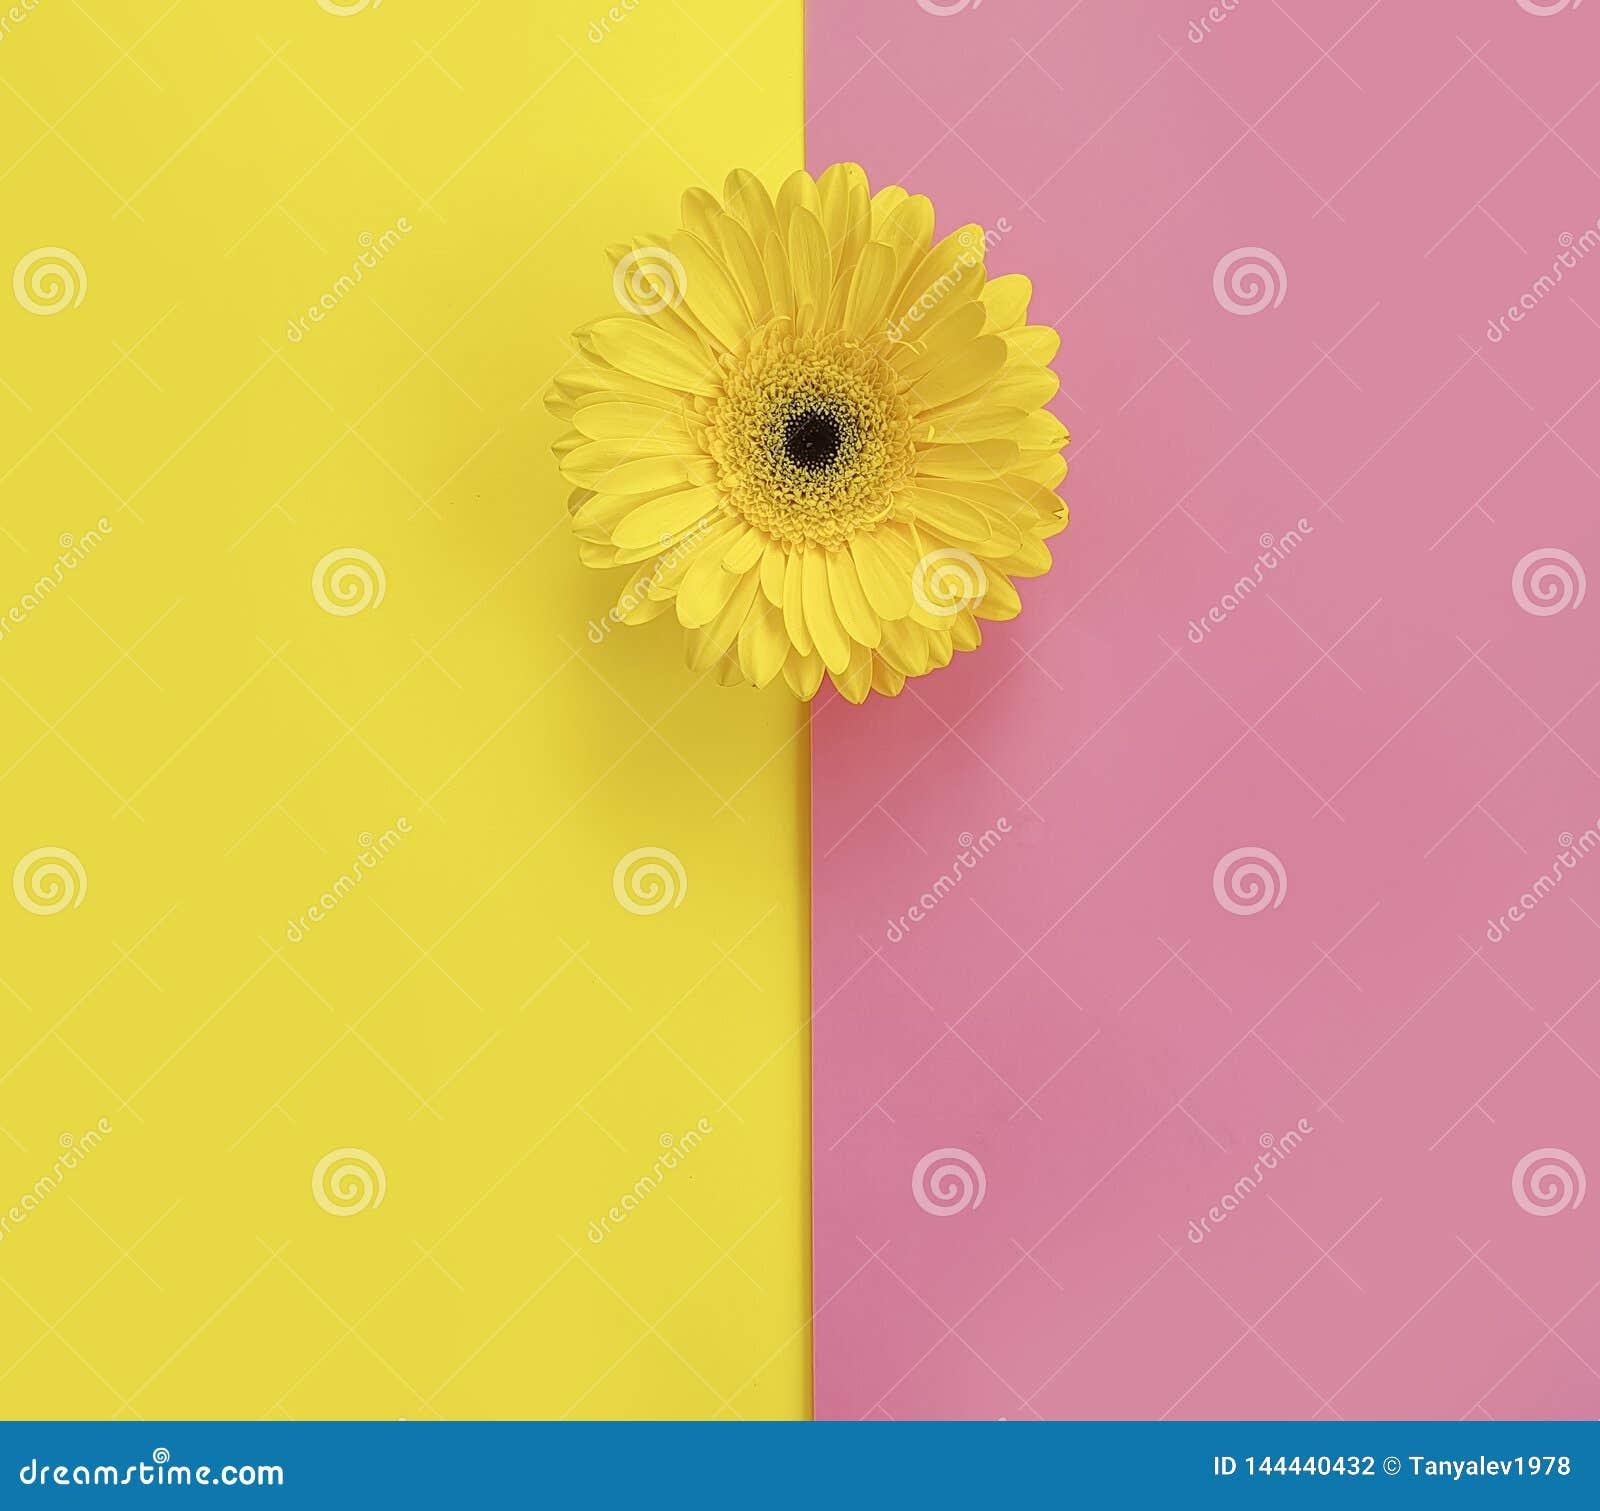 Flower gerbera on colorful texture romantic spring background beautiful minimalism creative